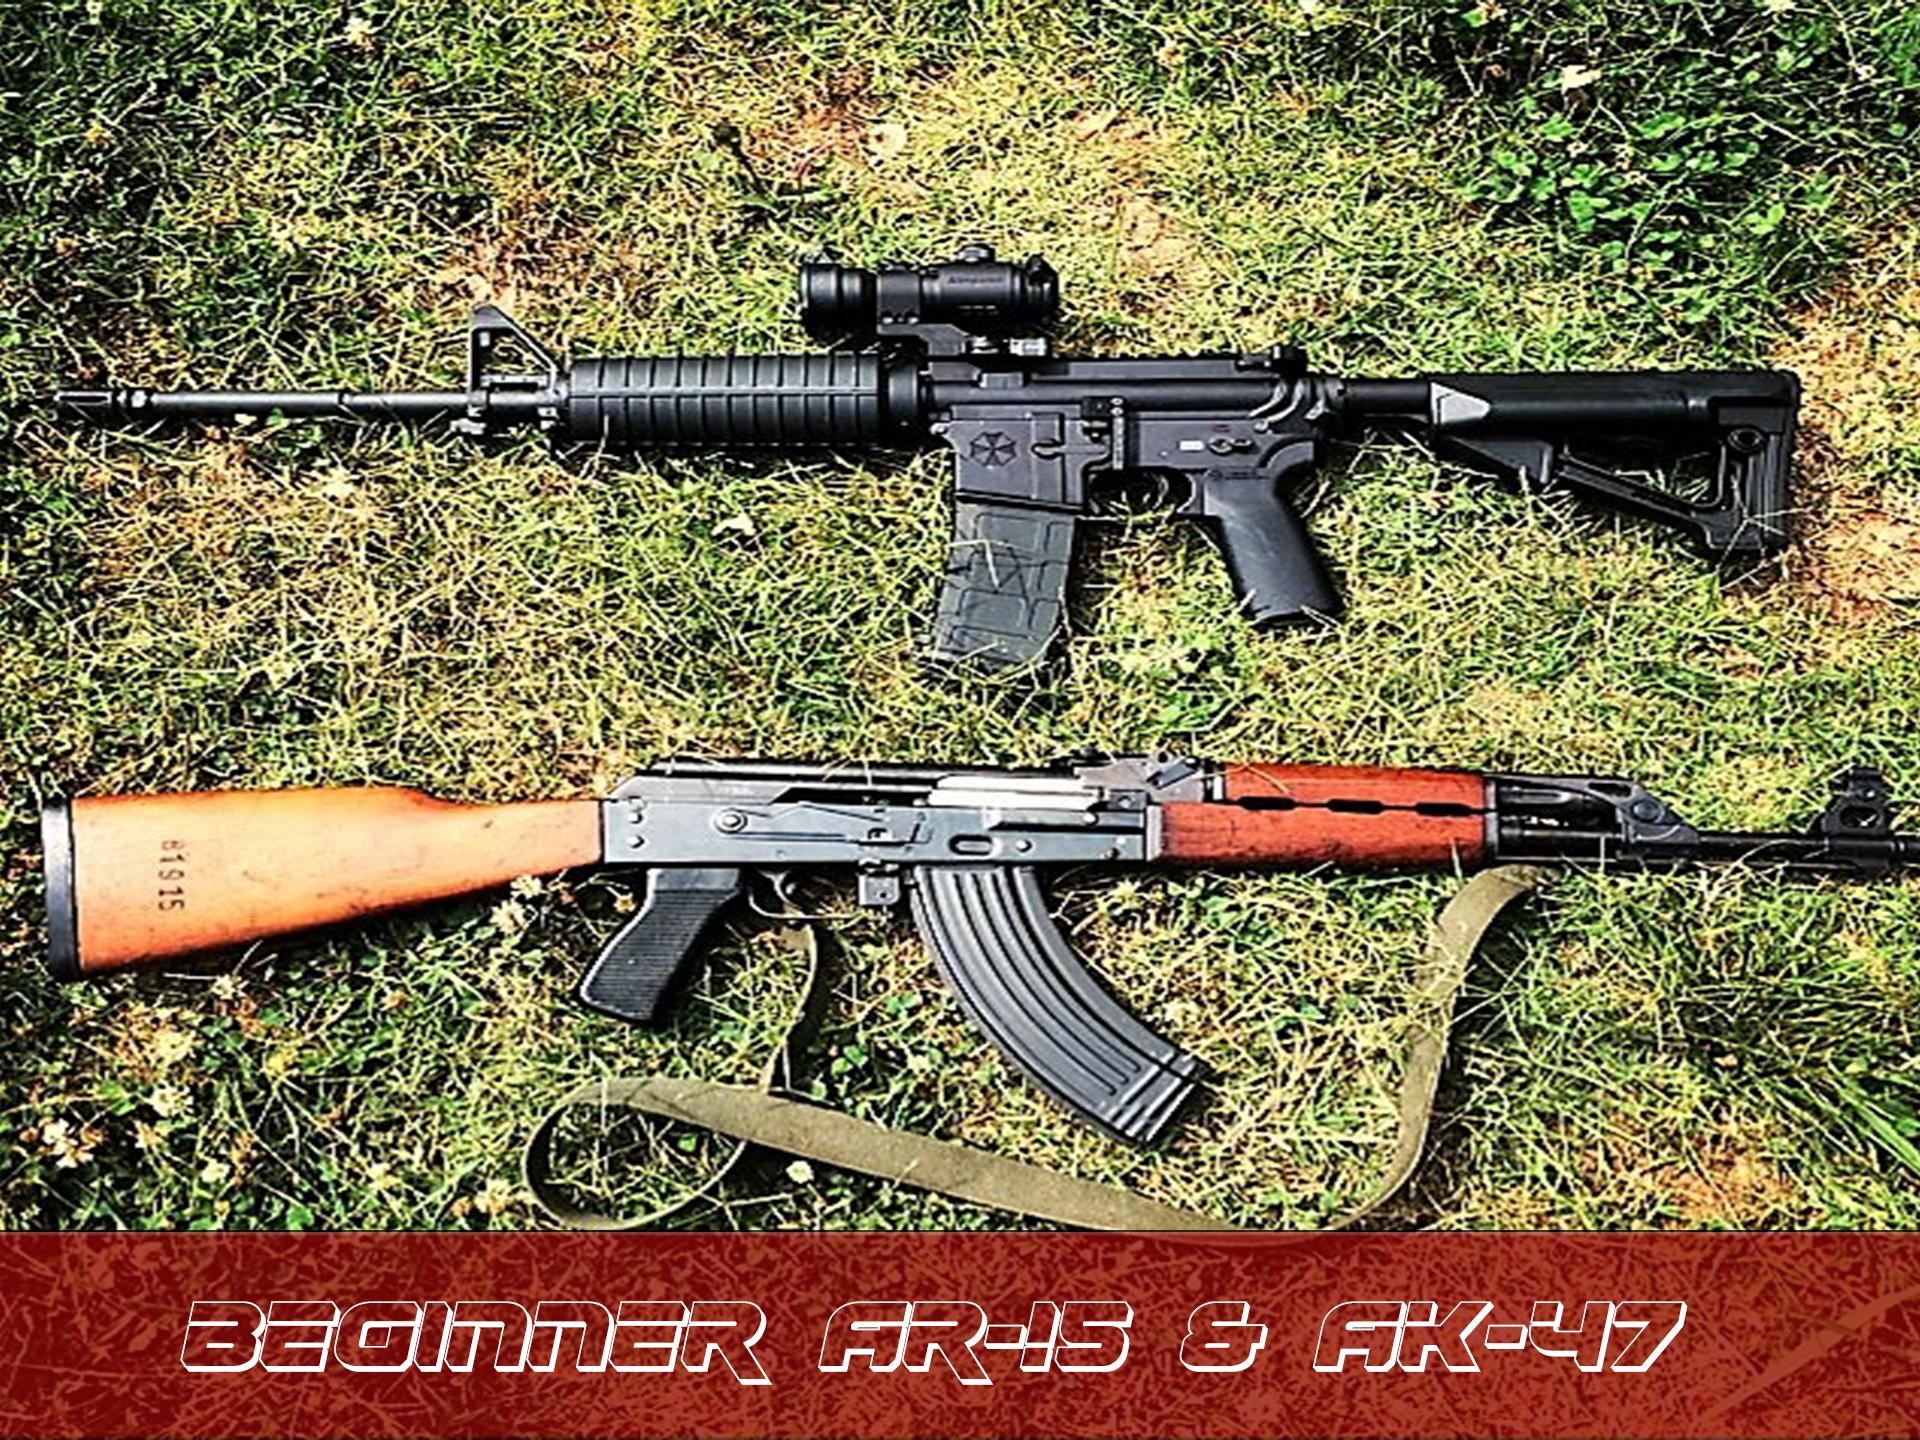 Beginner AR-15 & AK-47